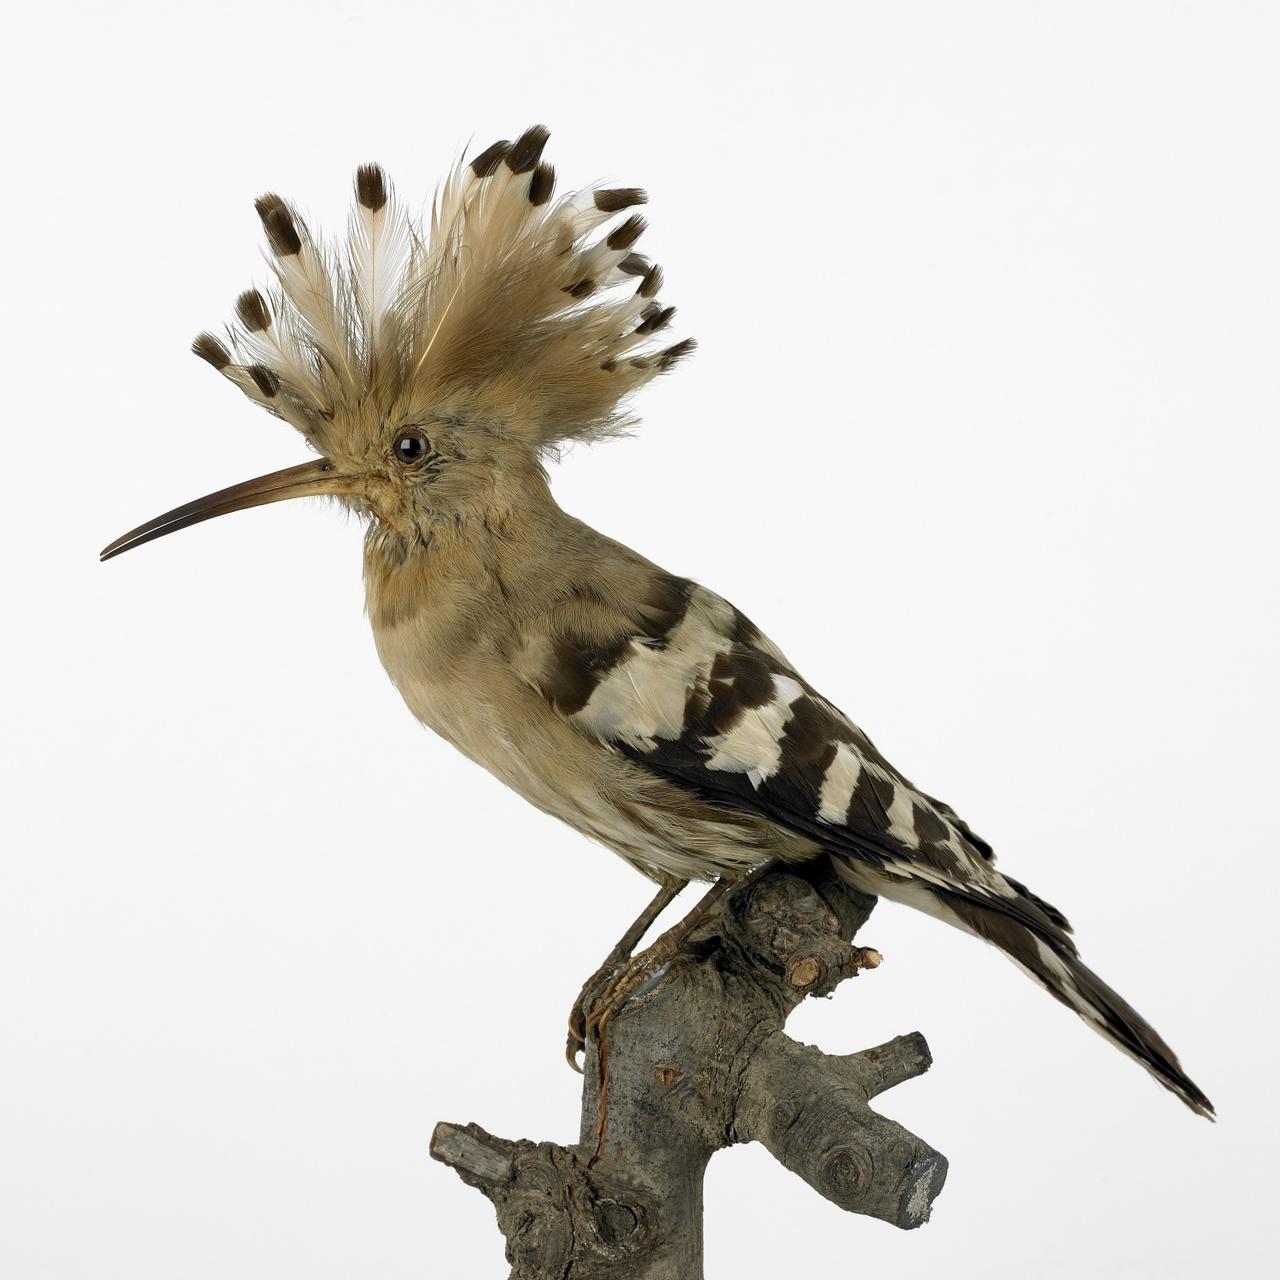 Upupa epops Linnaeus, 1758, Hop, opgezette vogel